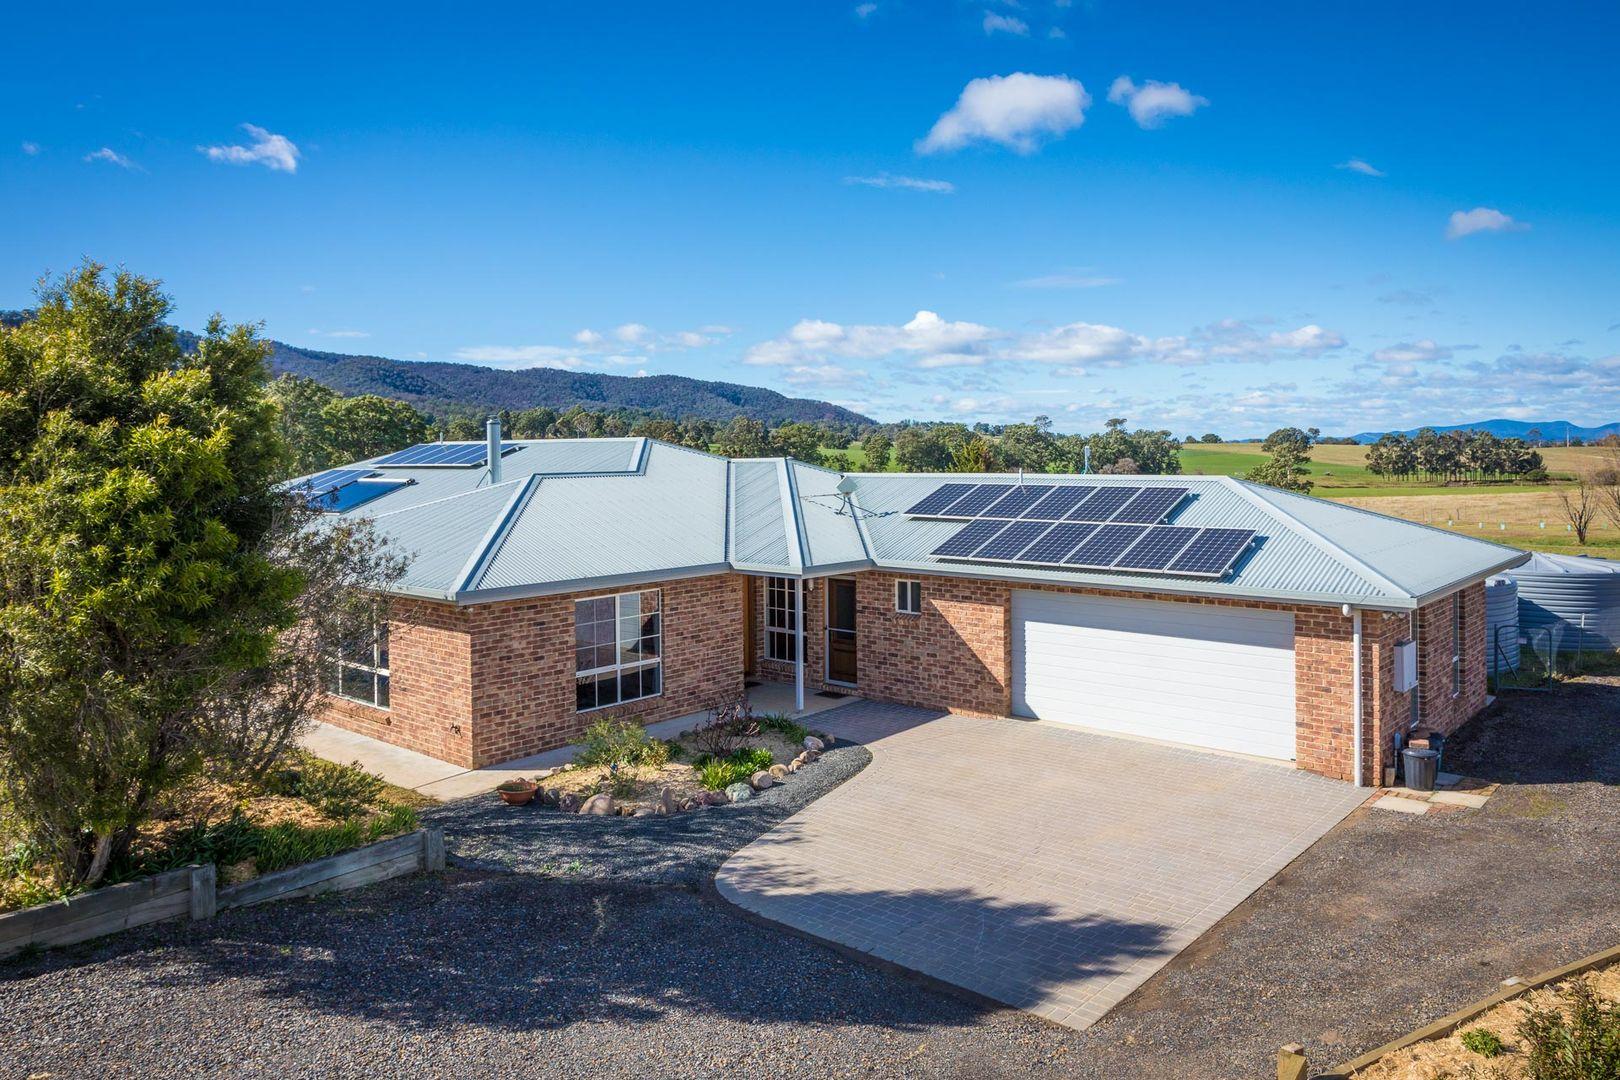 872 Polacks Flat Rd, Bemboka NSW 2550, Image 1